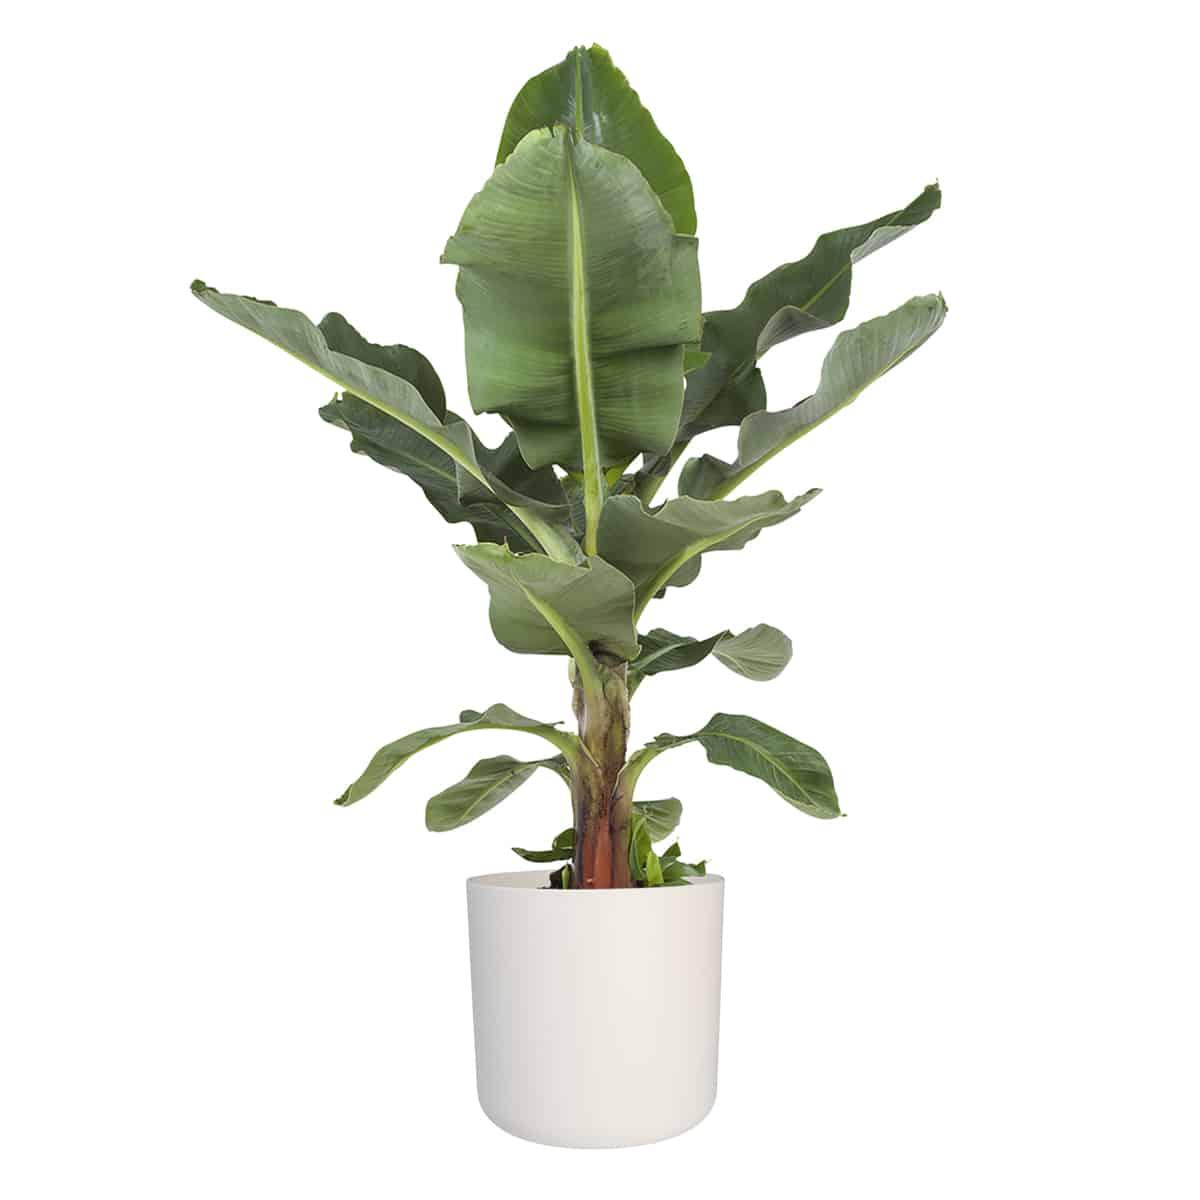 Bananenplant - Musa Dwarf Cavendish | Hippe kamerplanten 2020 | Homeseeds.nl